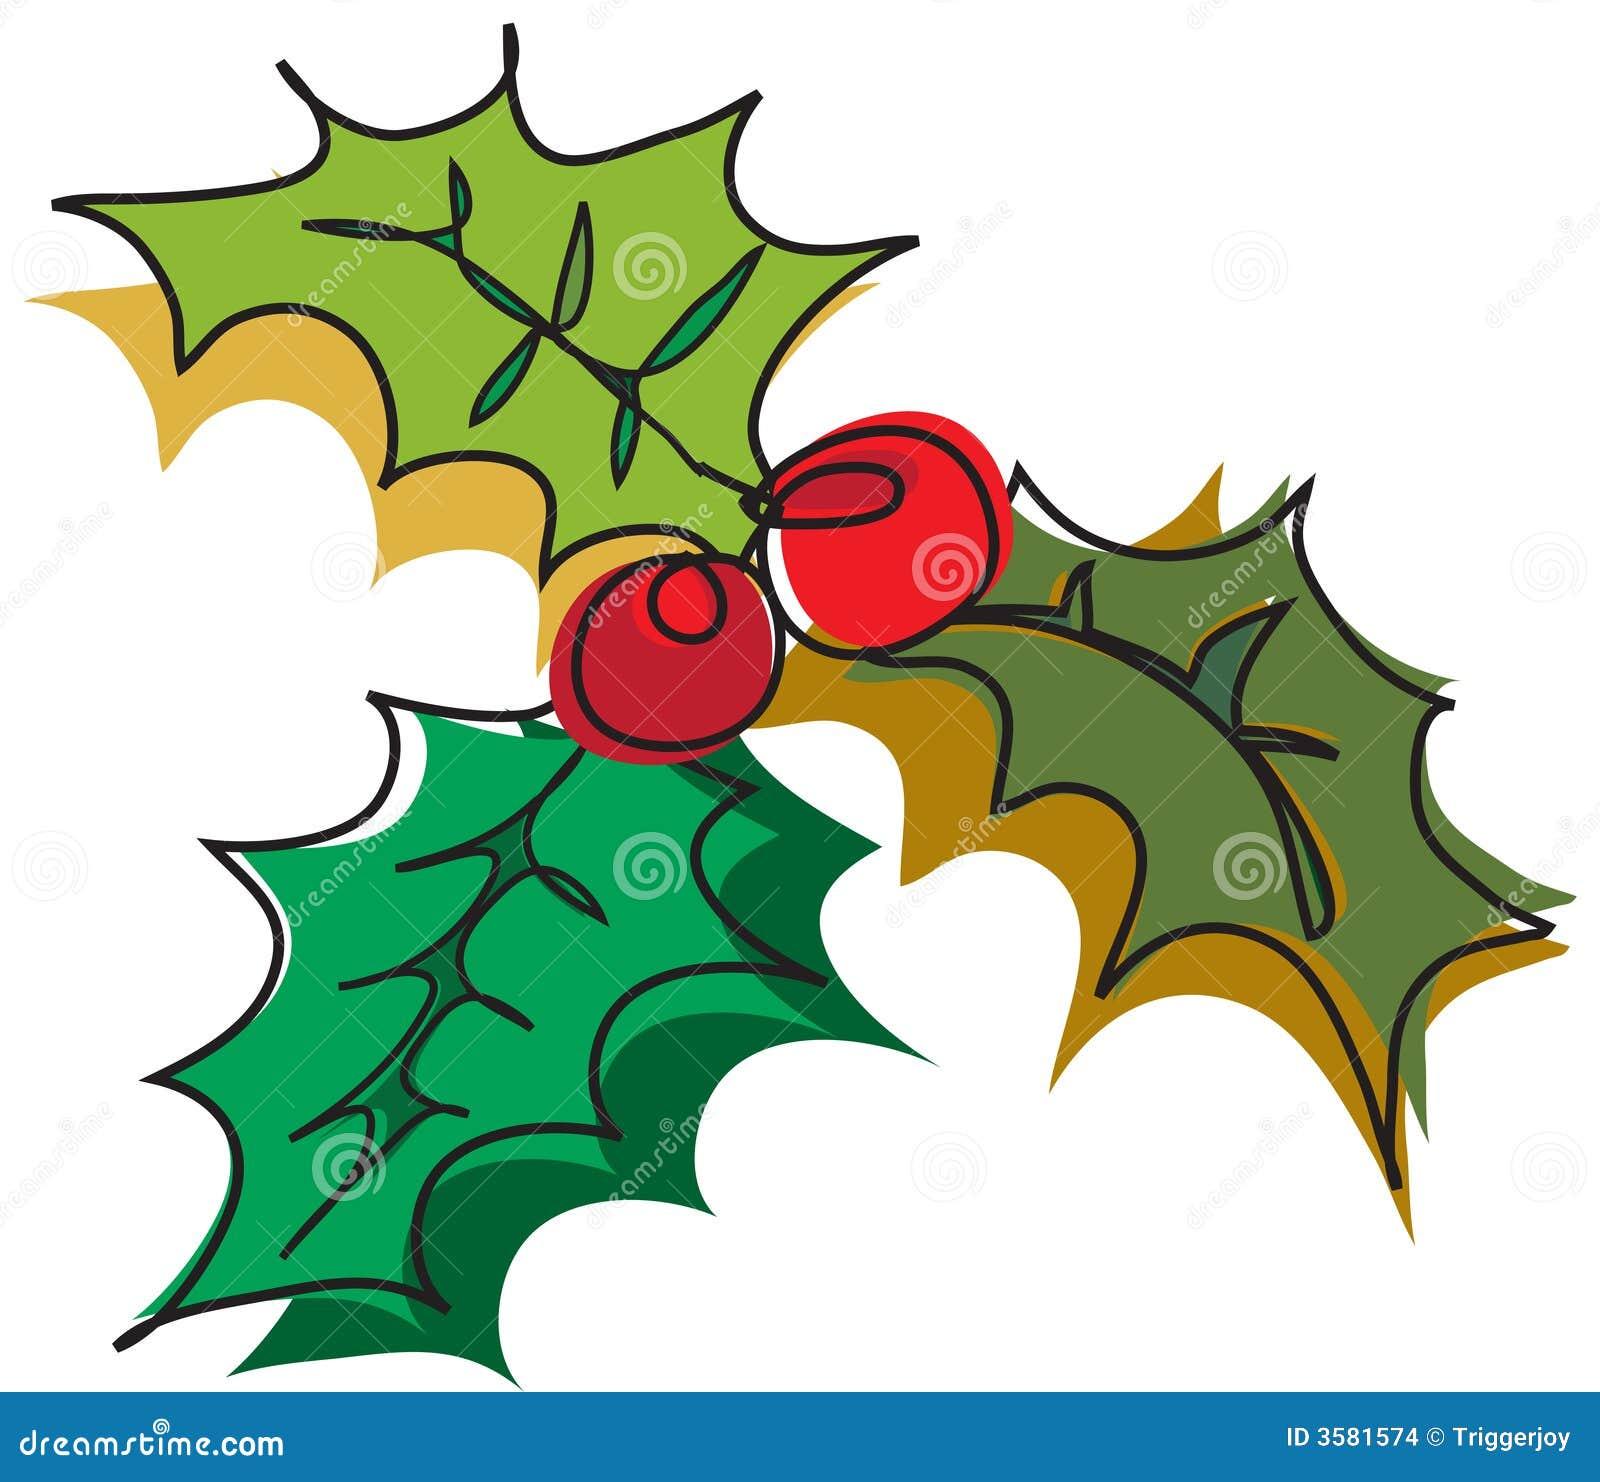 Royaltyfree Stock Photo Download Mistletoe Christmas